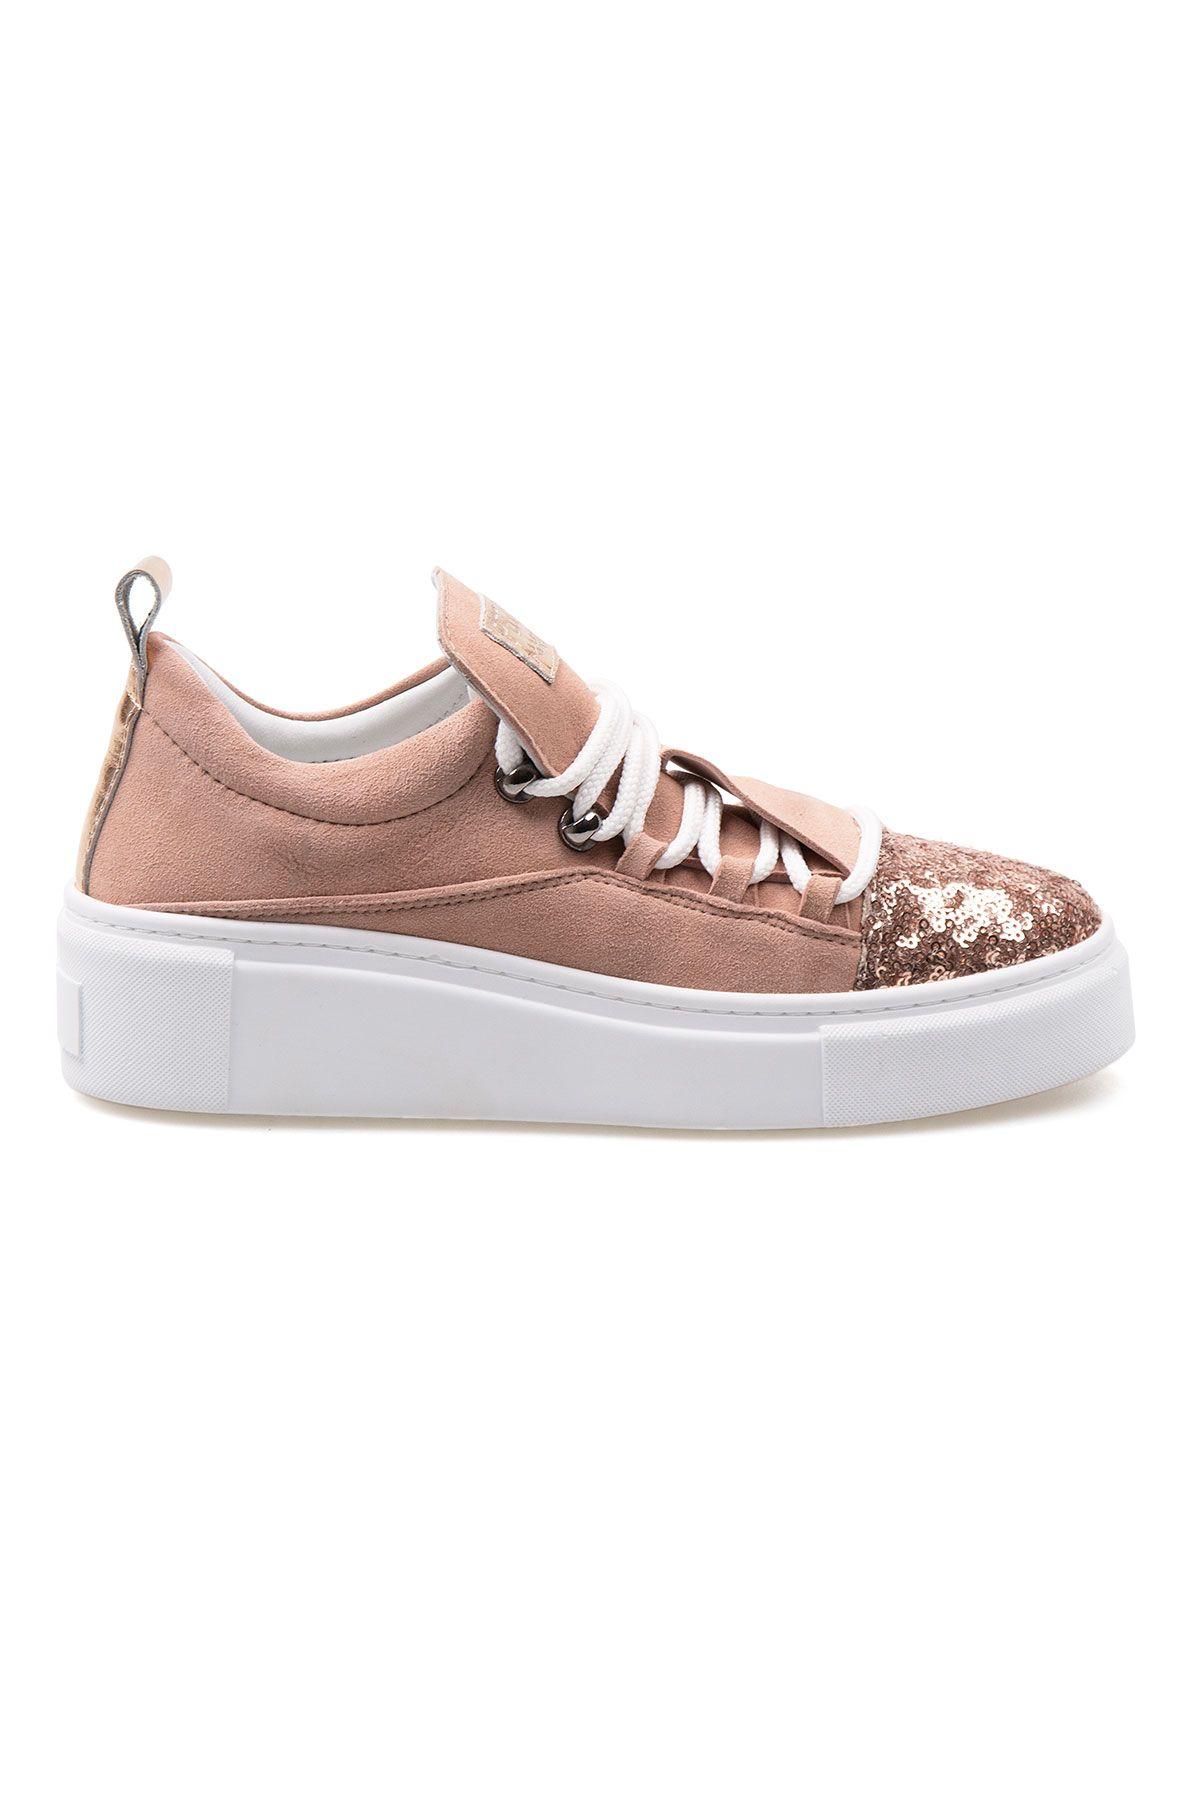 Pegia Genuine Leather Women's Sneaker LA1713 Powdery